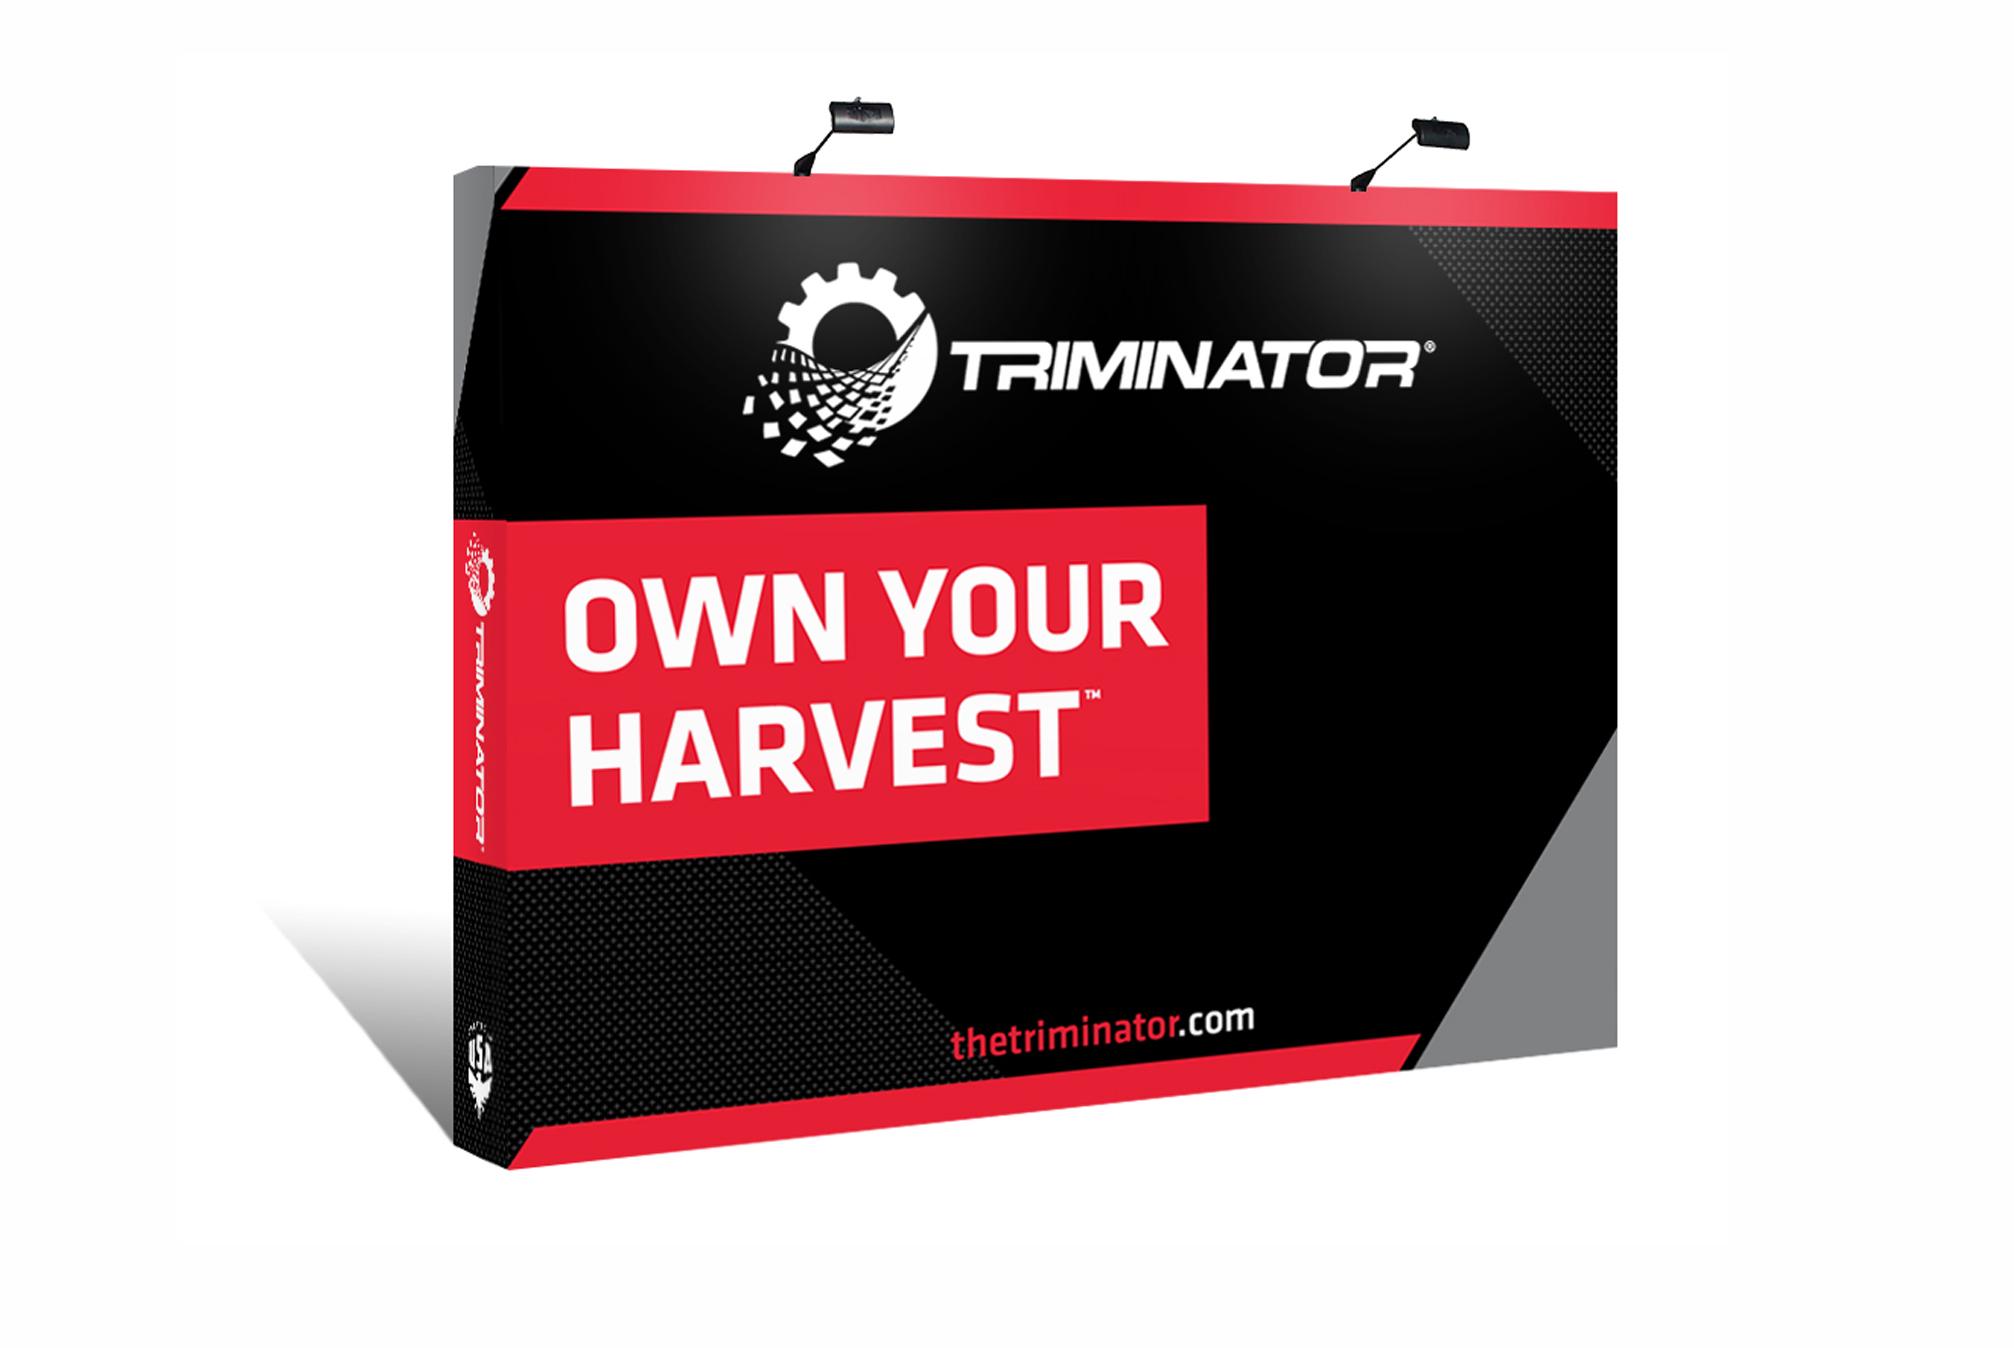 triminator-environmental-design-1.jpg